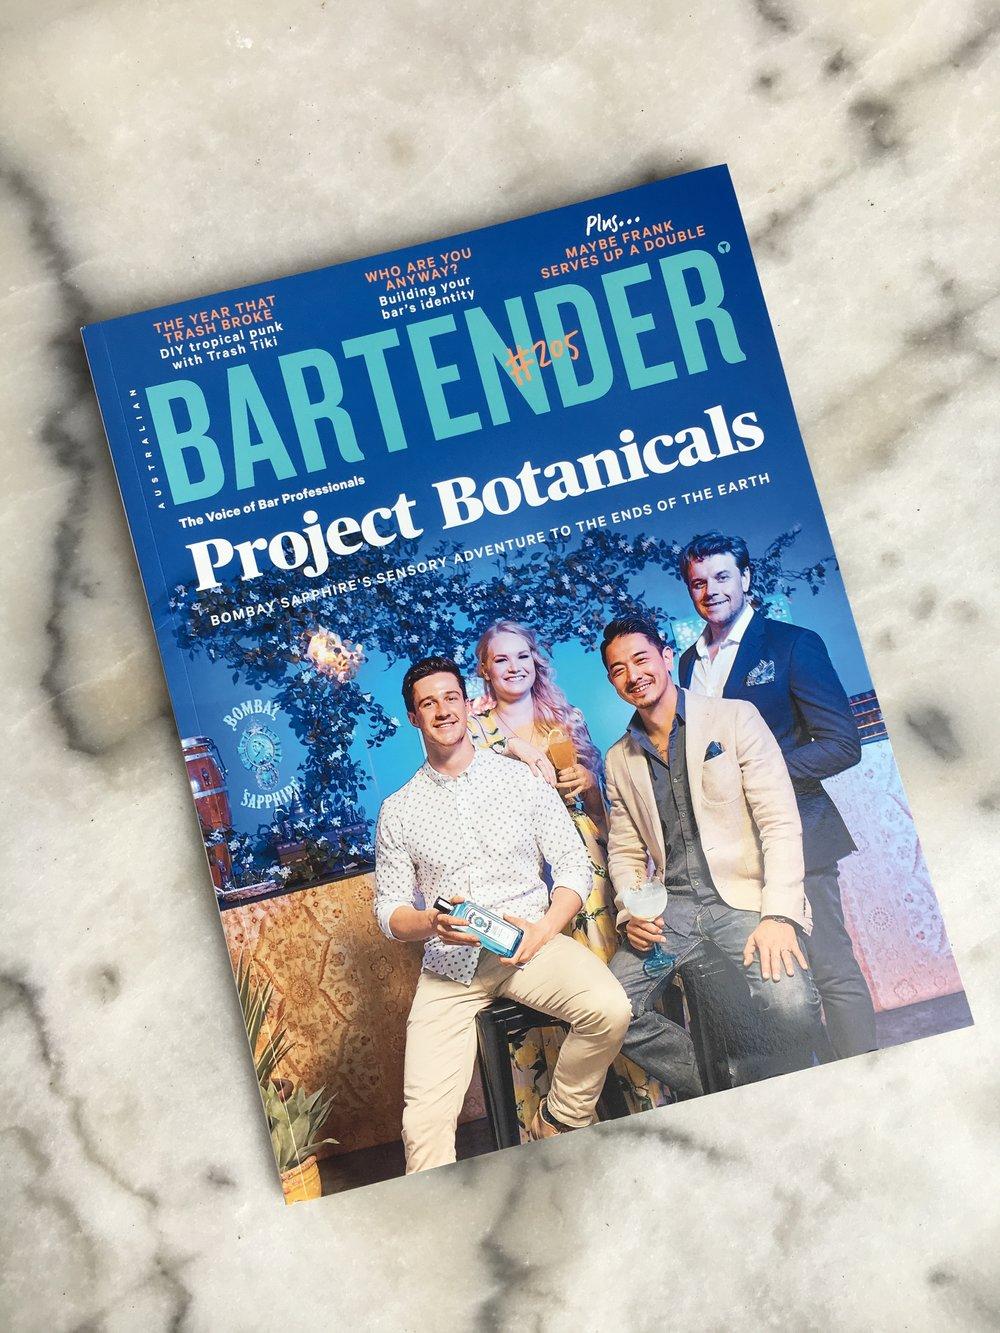 Kurtis here featured on the cover of Australian Bartender Magazine 2018.